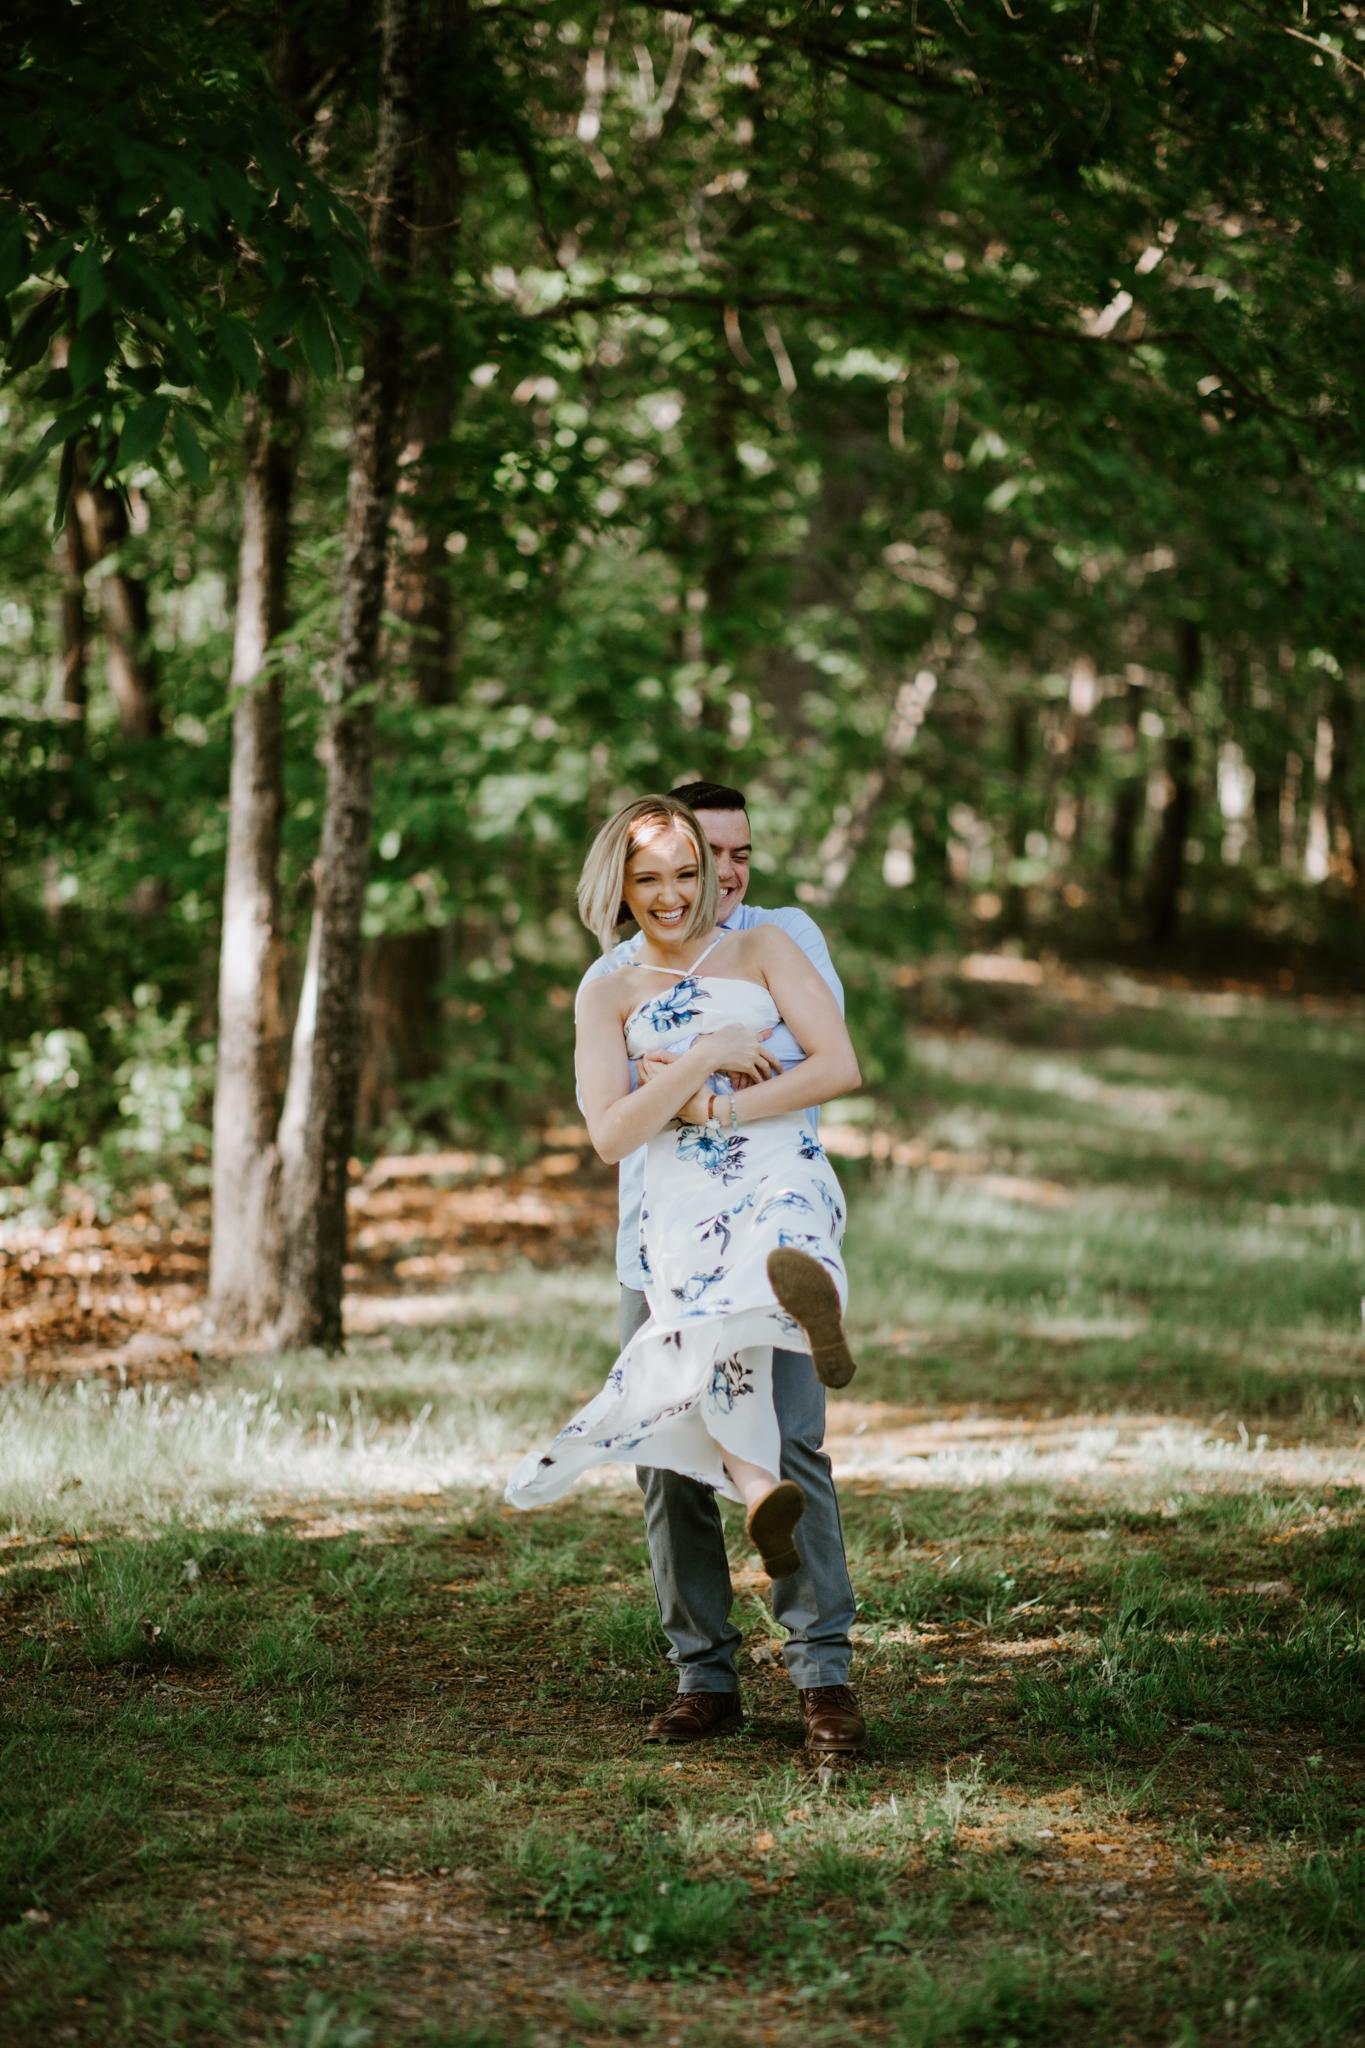 Courtney-Jordan-Chattanooga-Nashville-Tennessee-Wedding-Elopement-Photographer-31.jpg